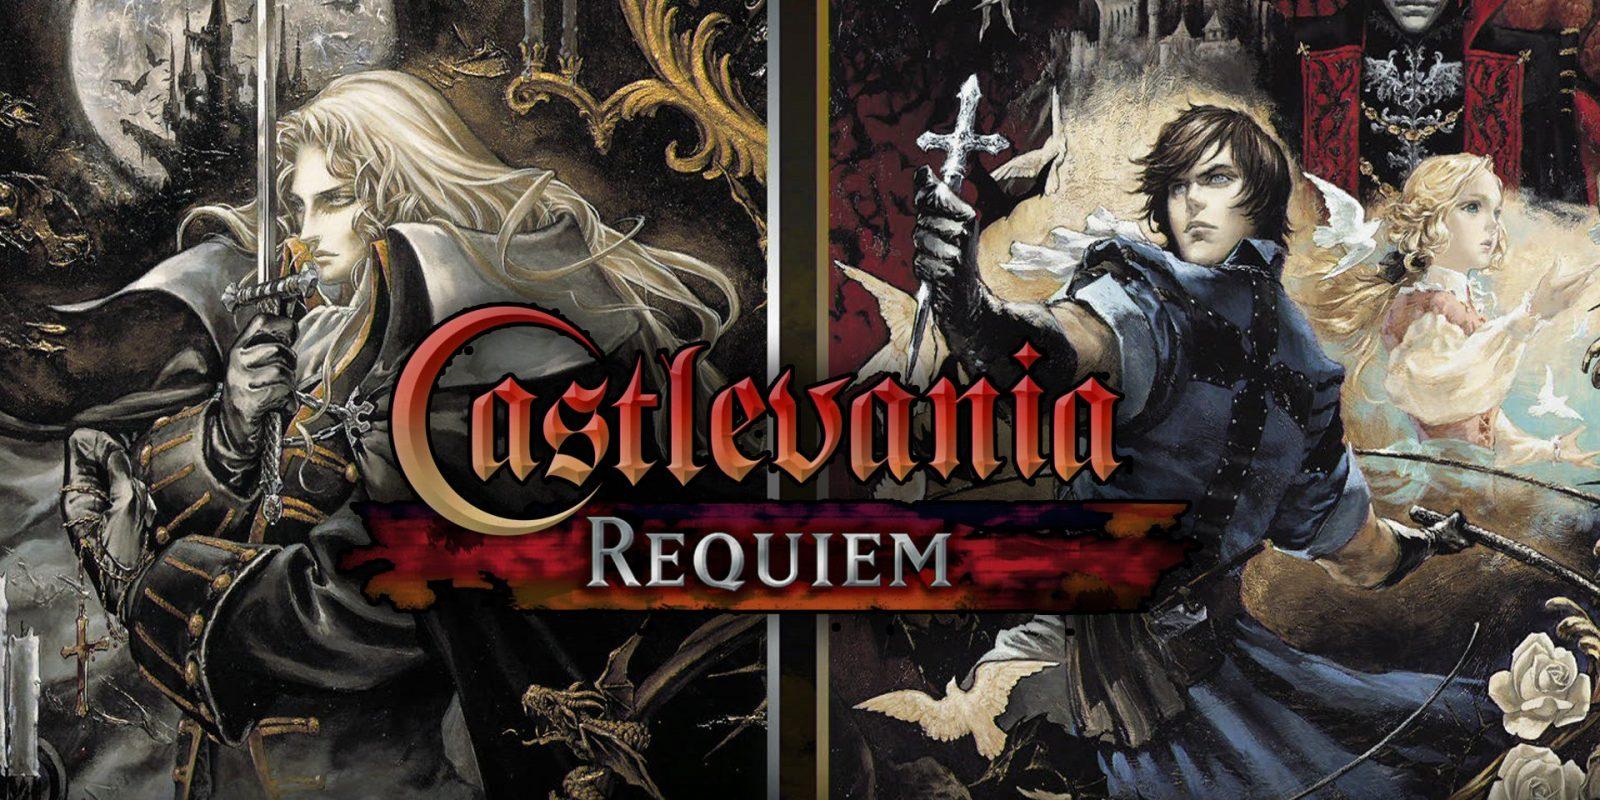 Today's Best Game Deals: Castlevania Requiem $10, Mario & Sonic Olympics $40, more